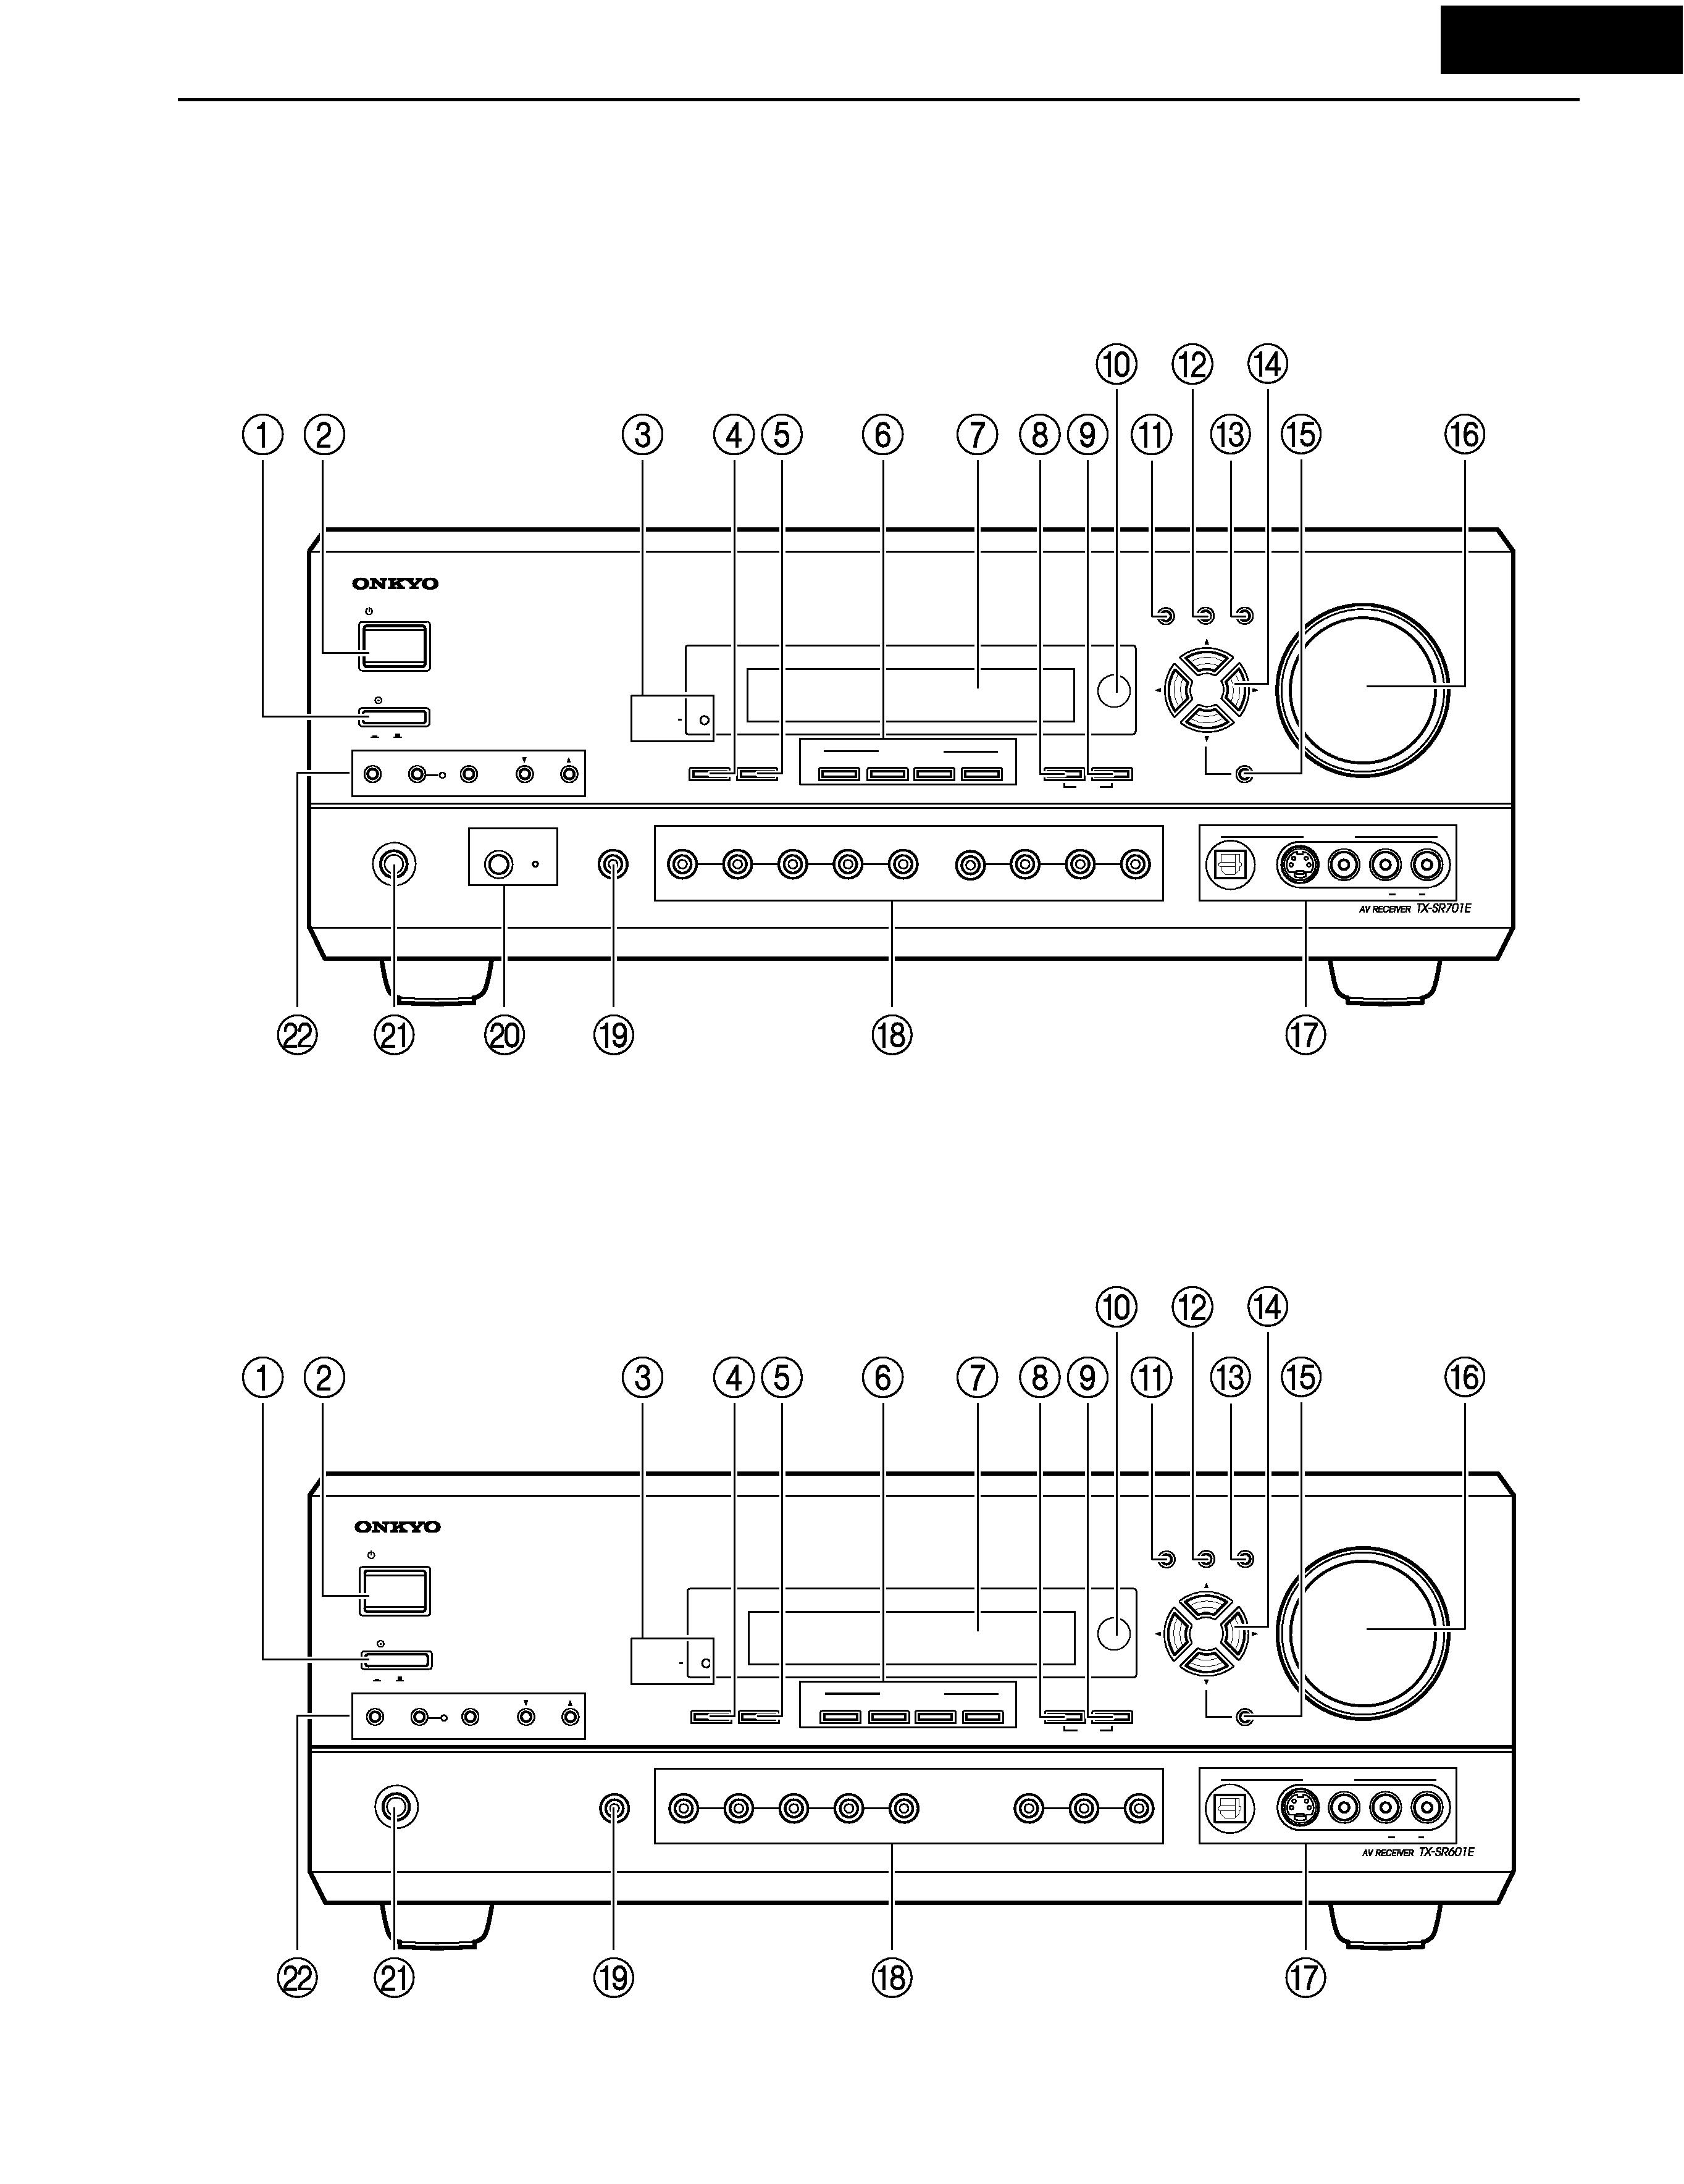 service manual for onkyo tx-sr601